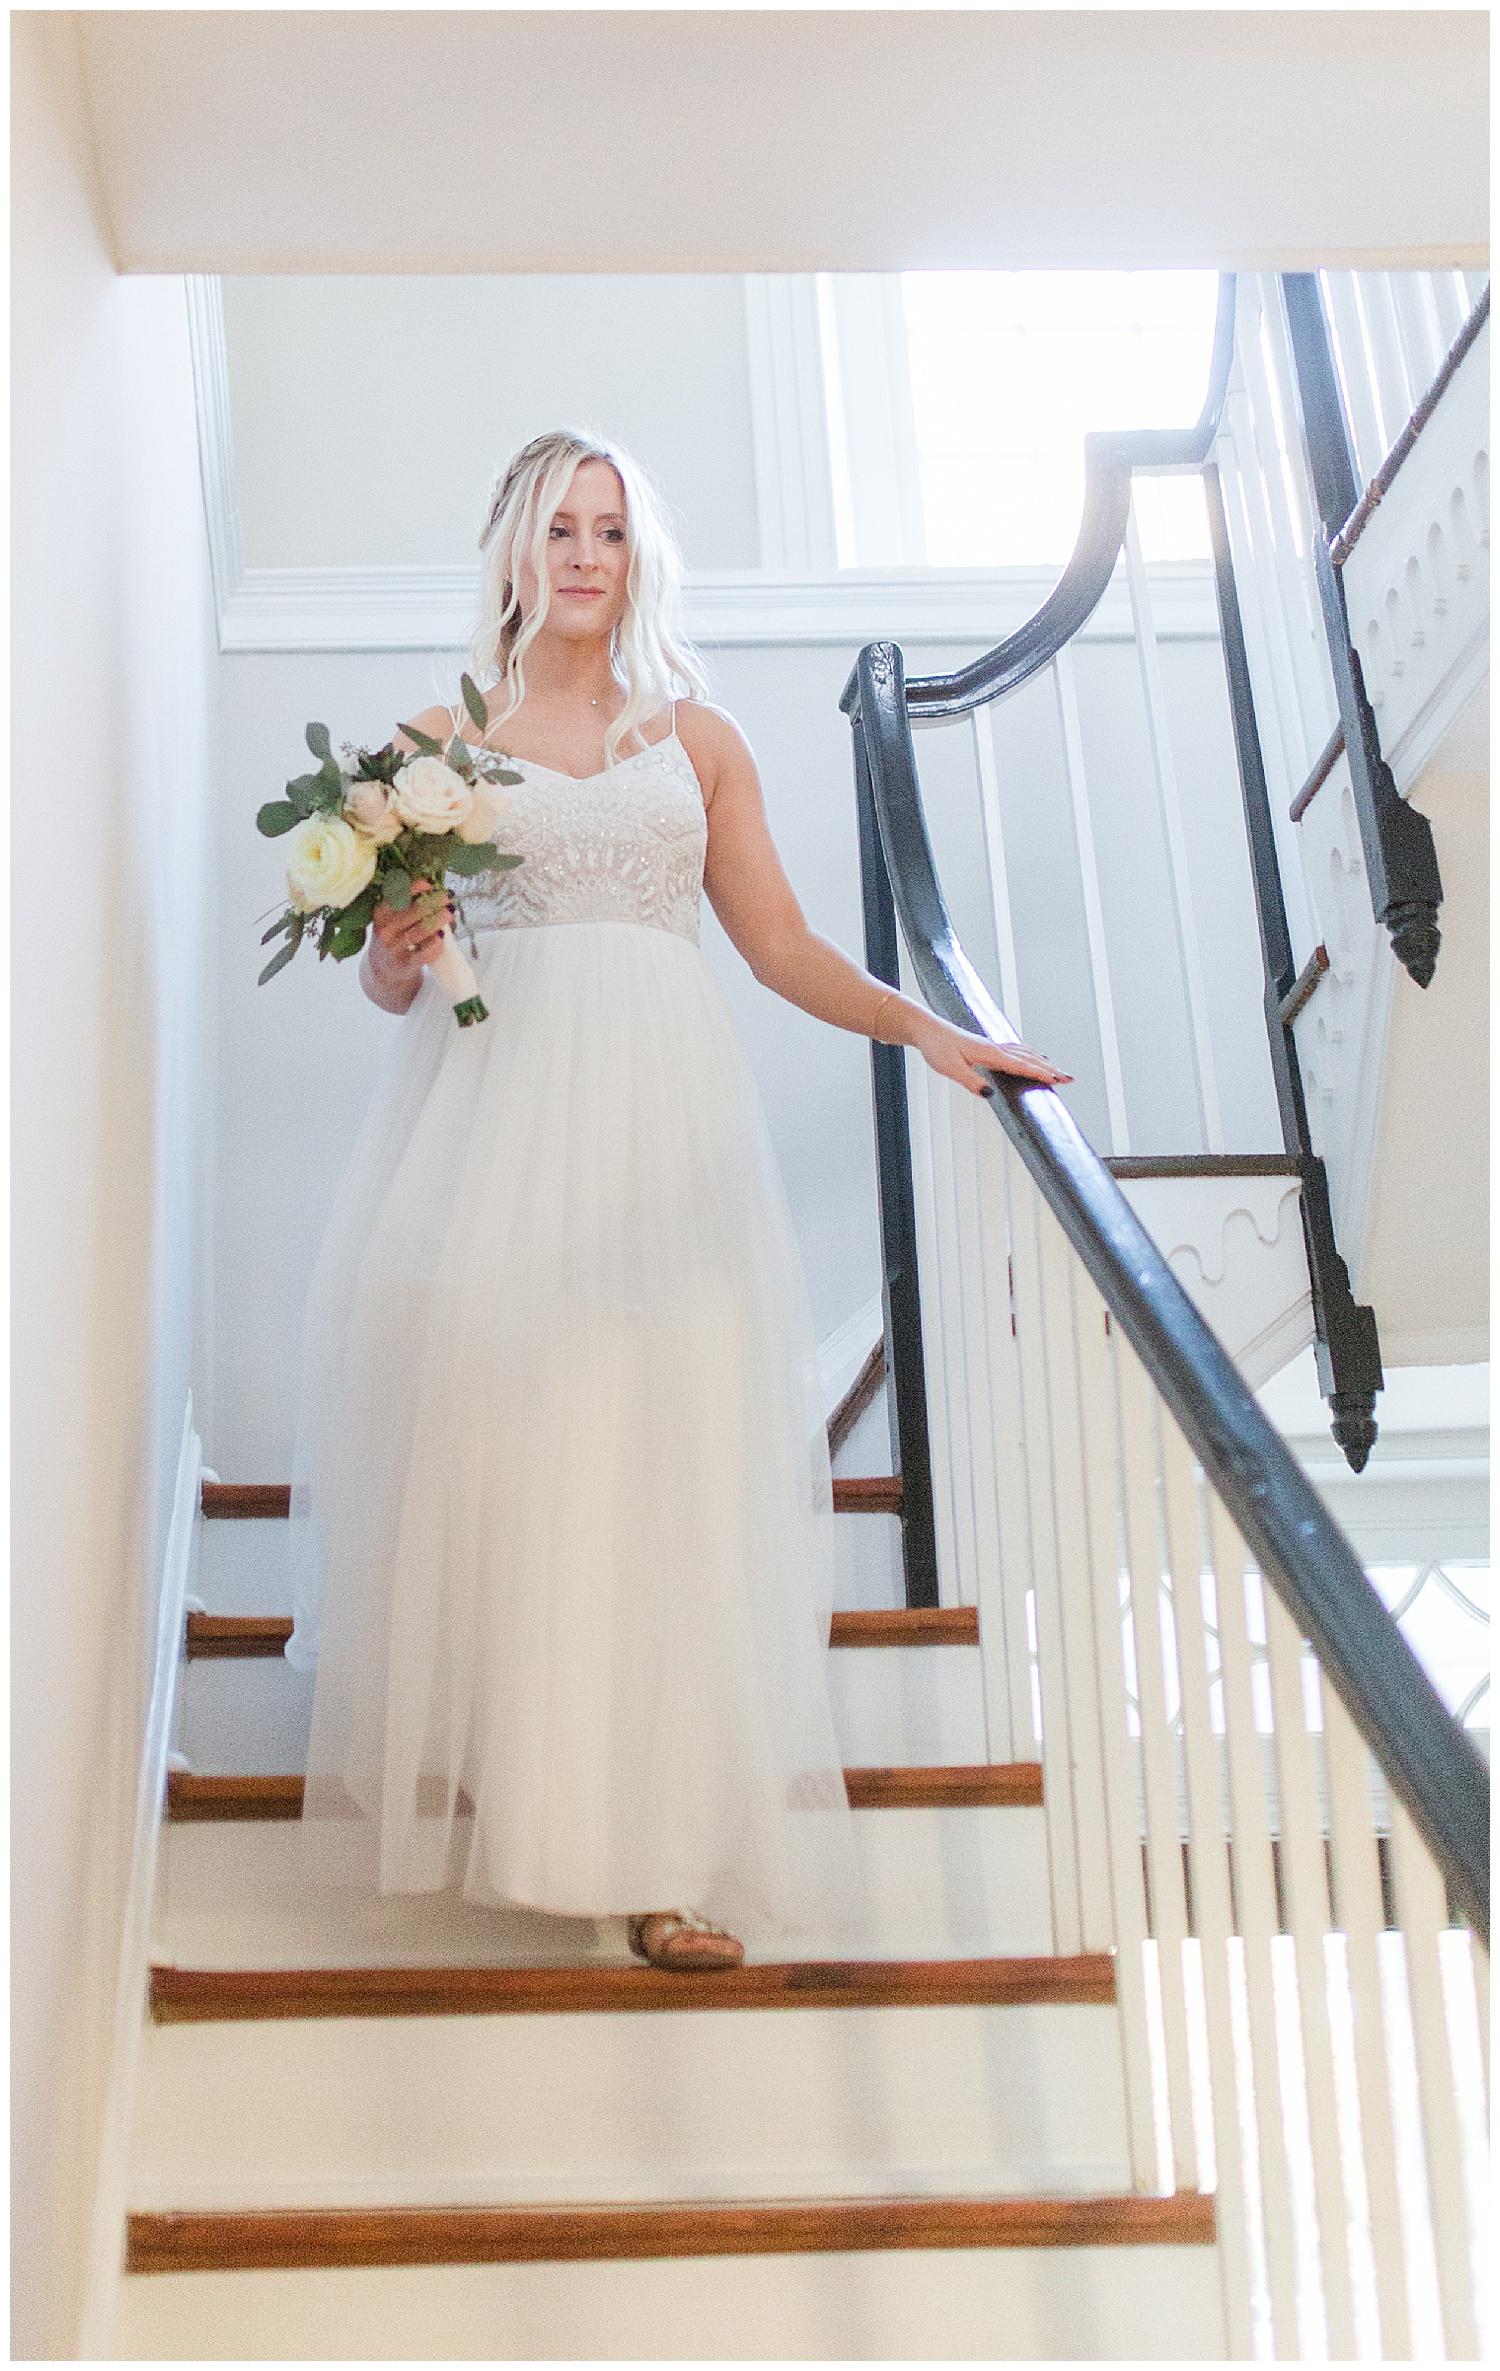 Bienvue Wedding - Powhattan Virginia Wedding Photographer